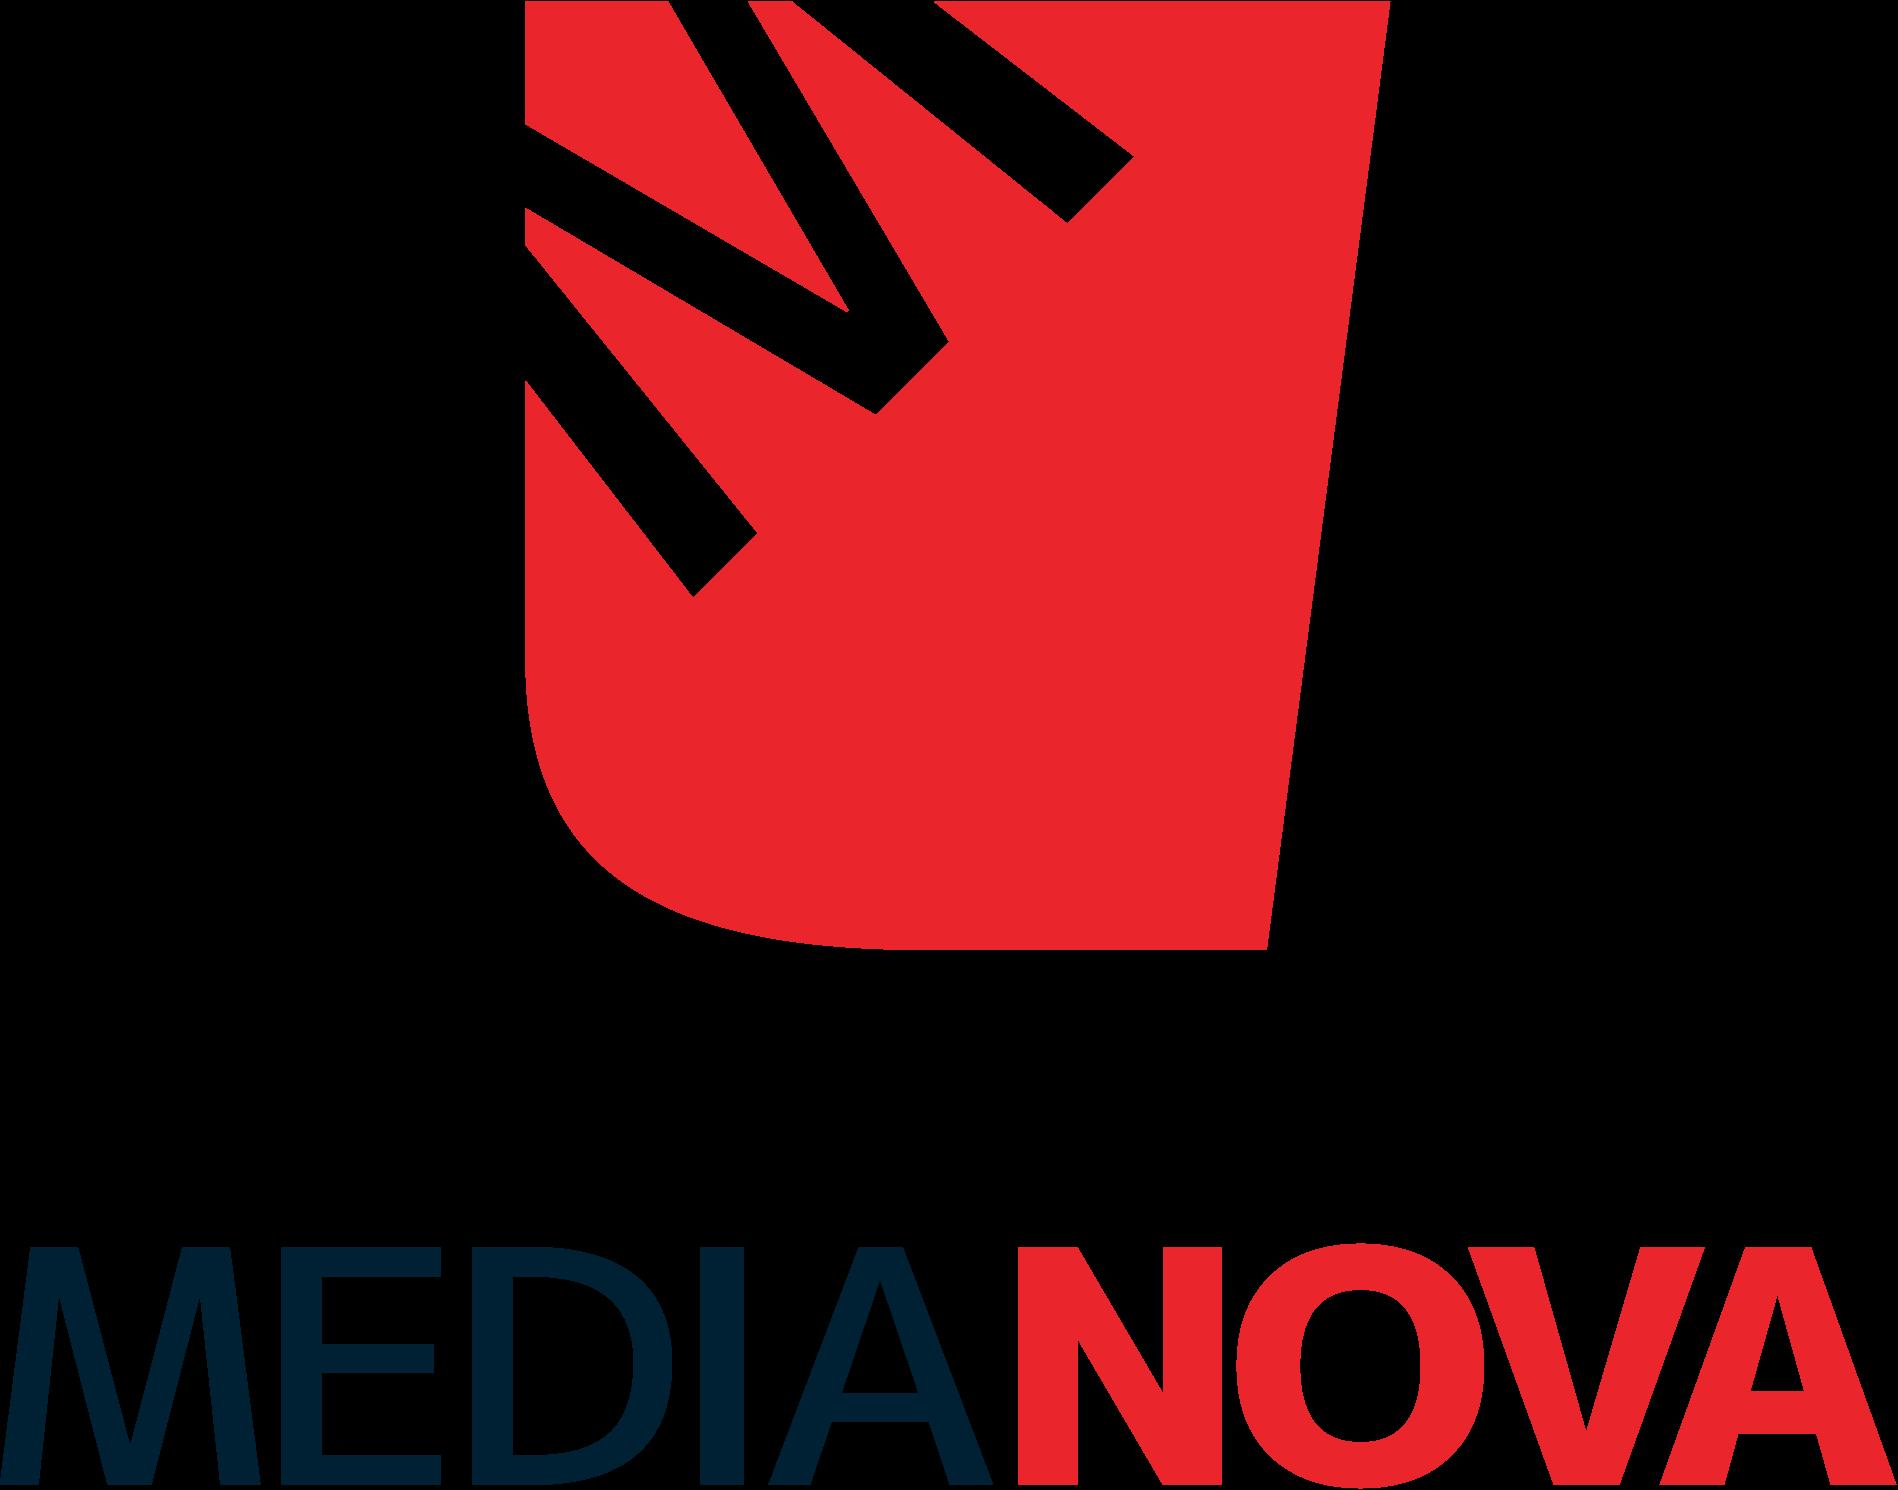 Top Best CDN Providers in 2021 that Speed Up Your Website